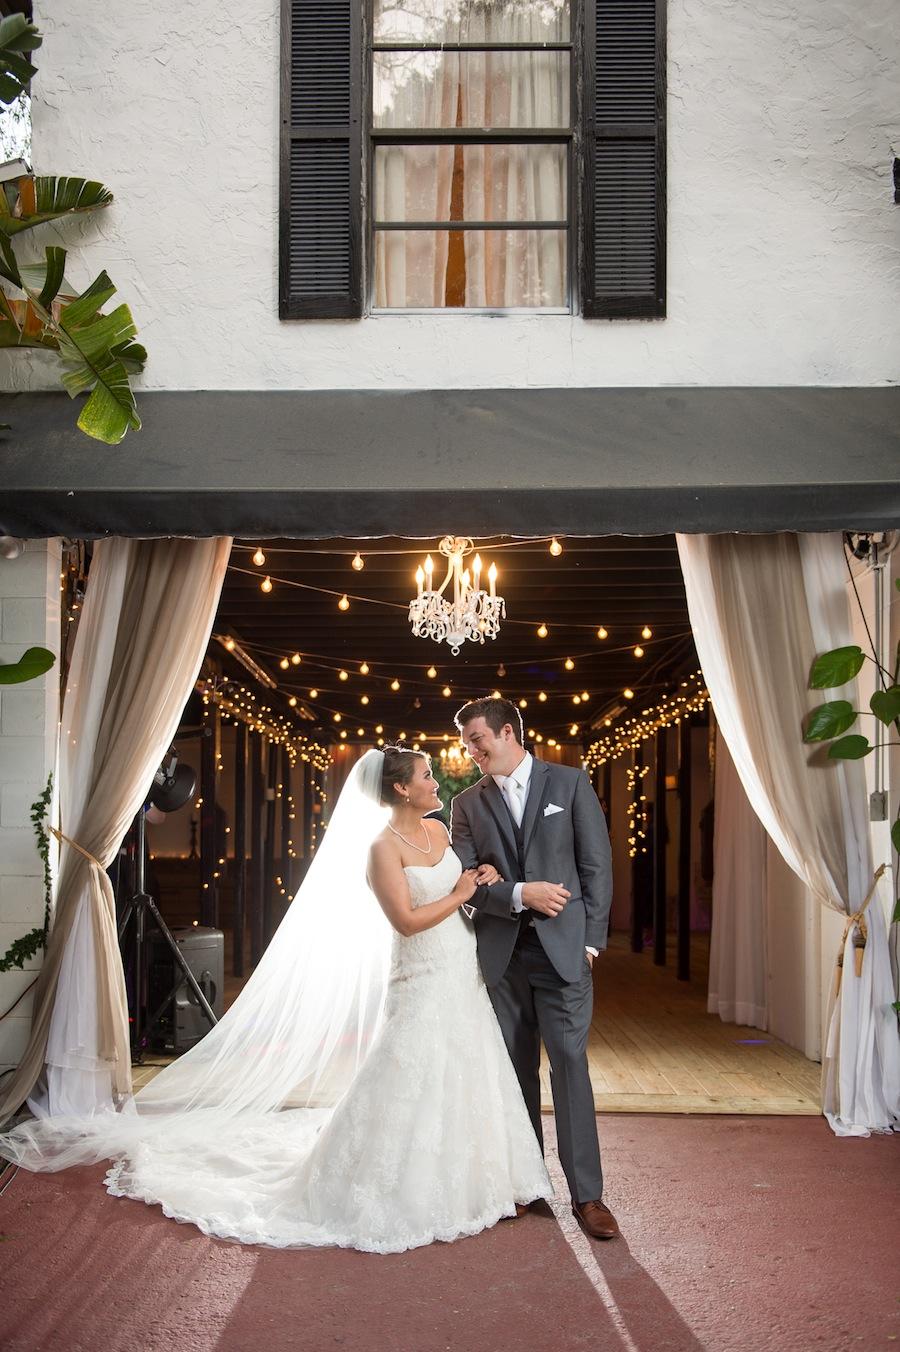 Bride and Groom Rustic Wedding Portrait at Karnes Stables   Marc Edwards Photographs